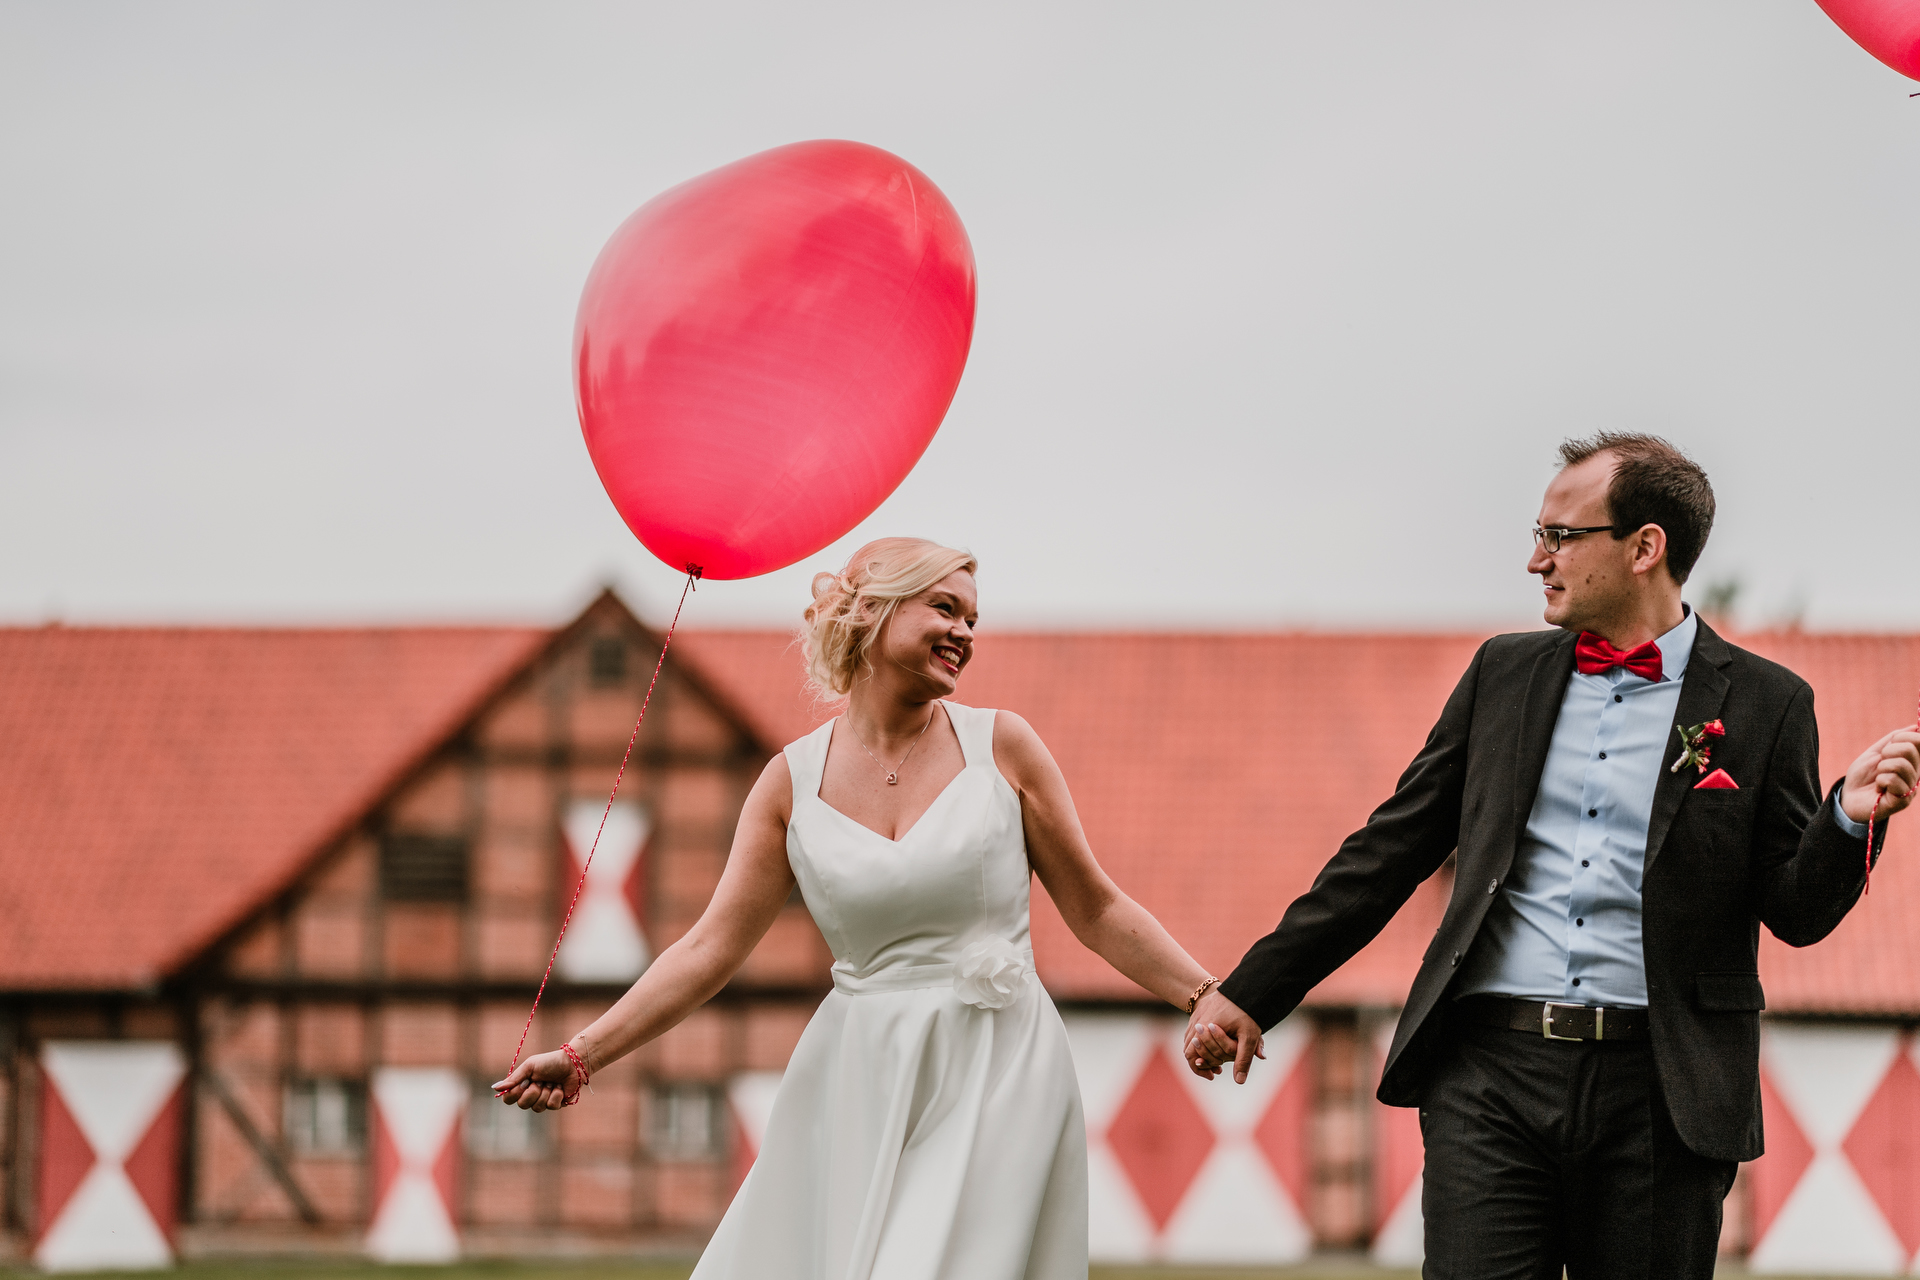 Hzt-Ann-Christin-Stefan-Standesamt-05-2019-031